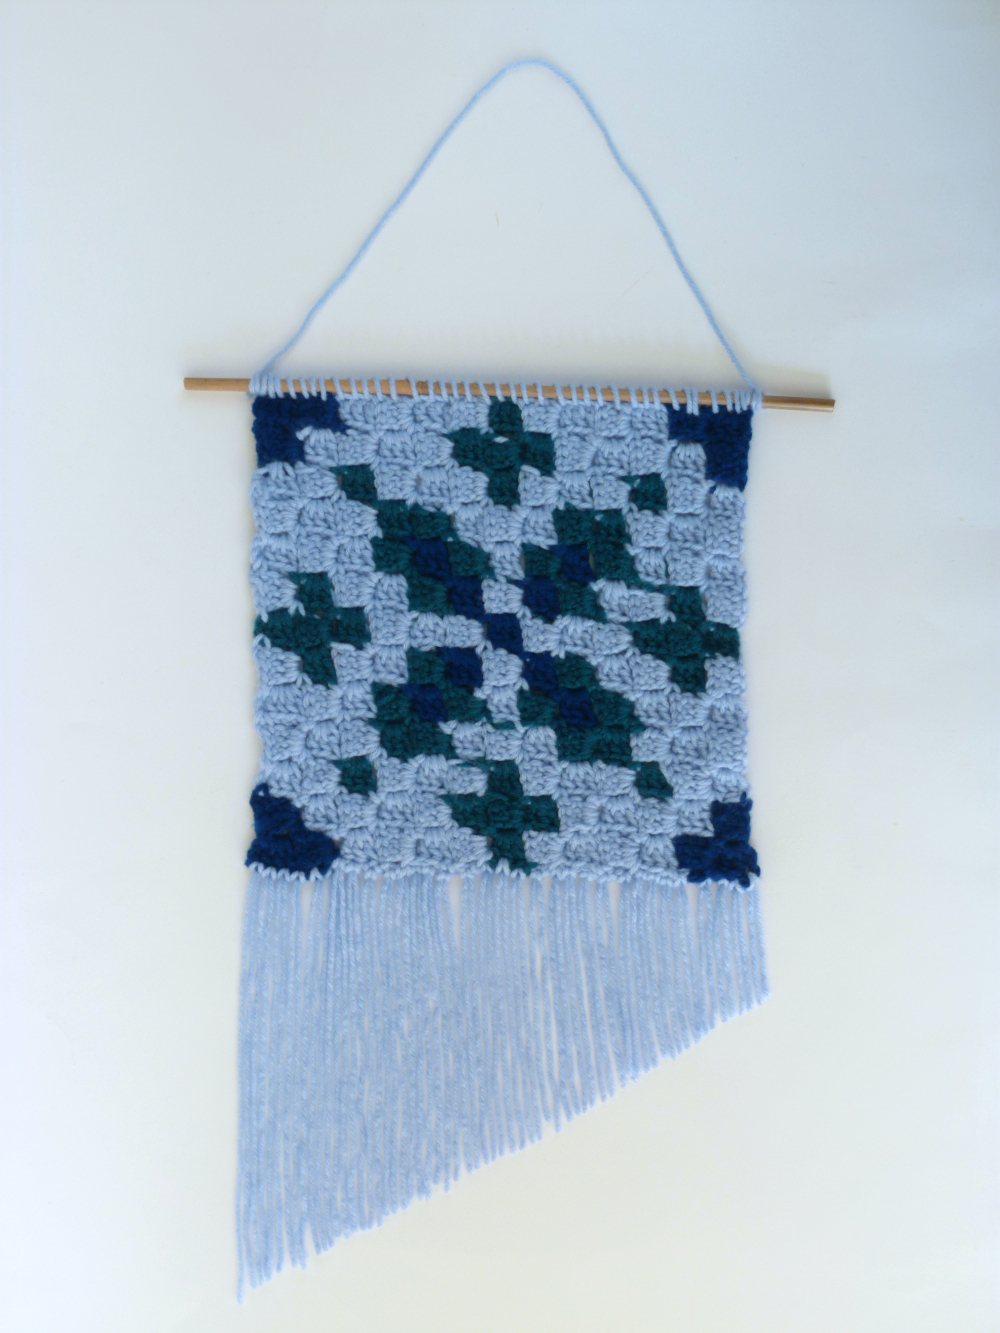 Icy blue adjustable crochet top